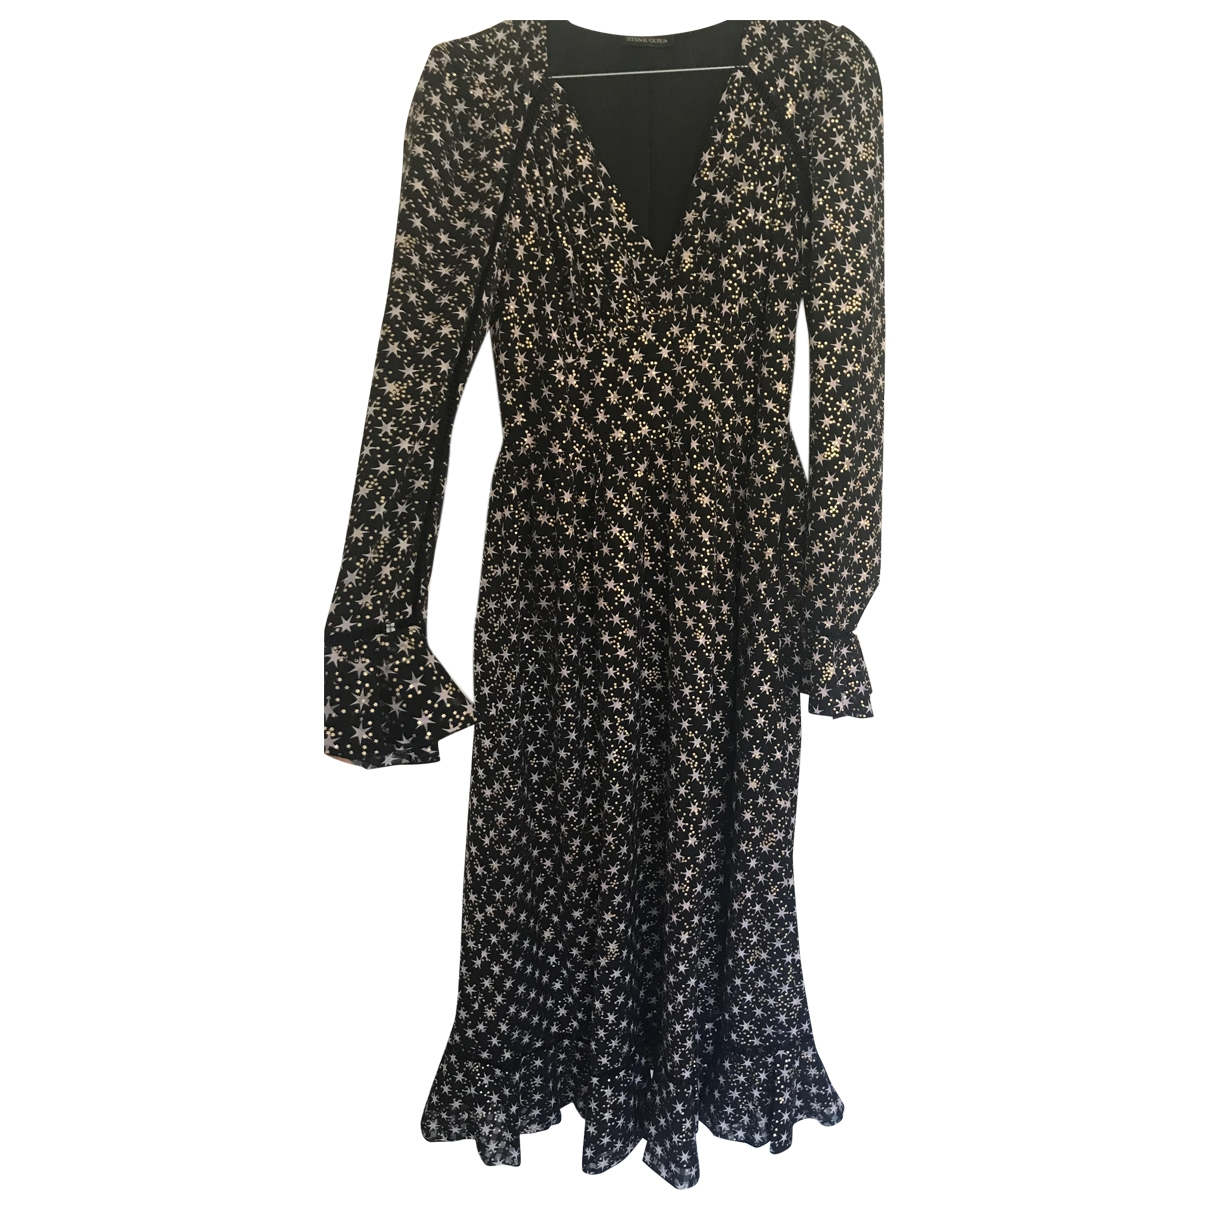 Stine Goya \N Kleid in  Schwarz Polyester